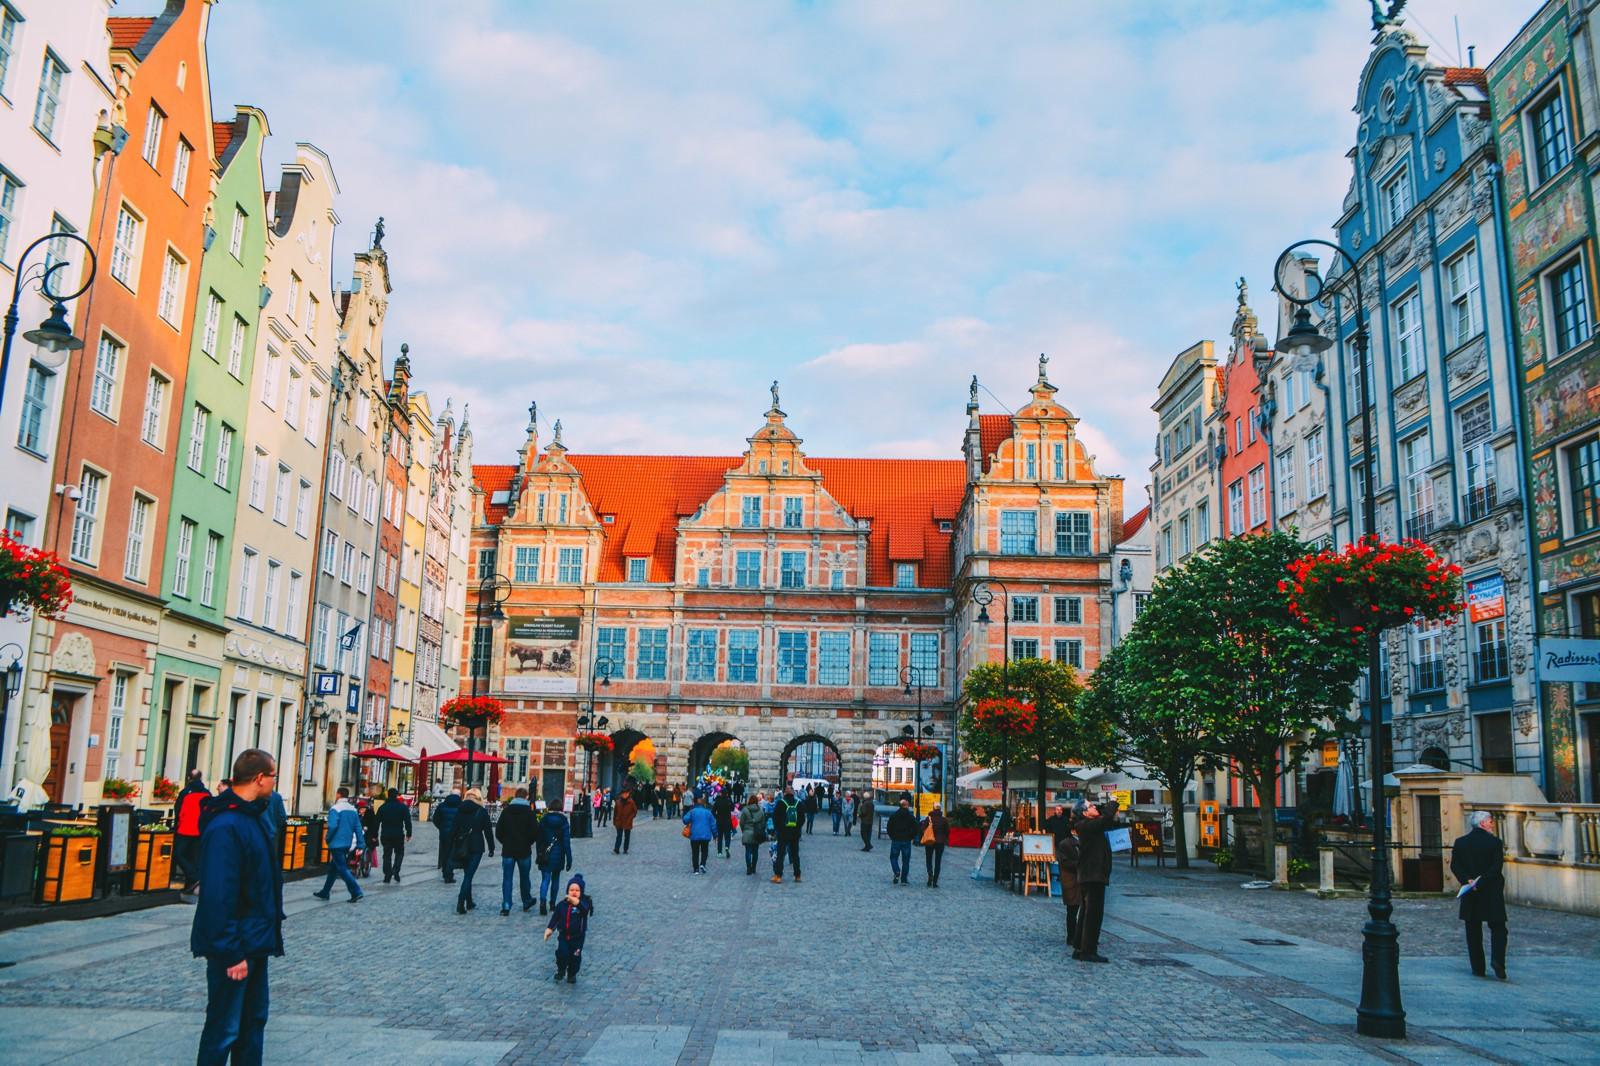 perierga.gr - Το μαγευτικό Gdansk στην Πολωνία θυμίζει σκηνικό σε ταινία εποχής!